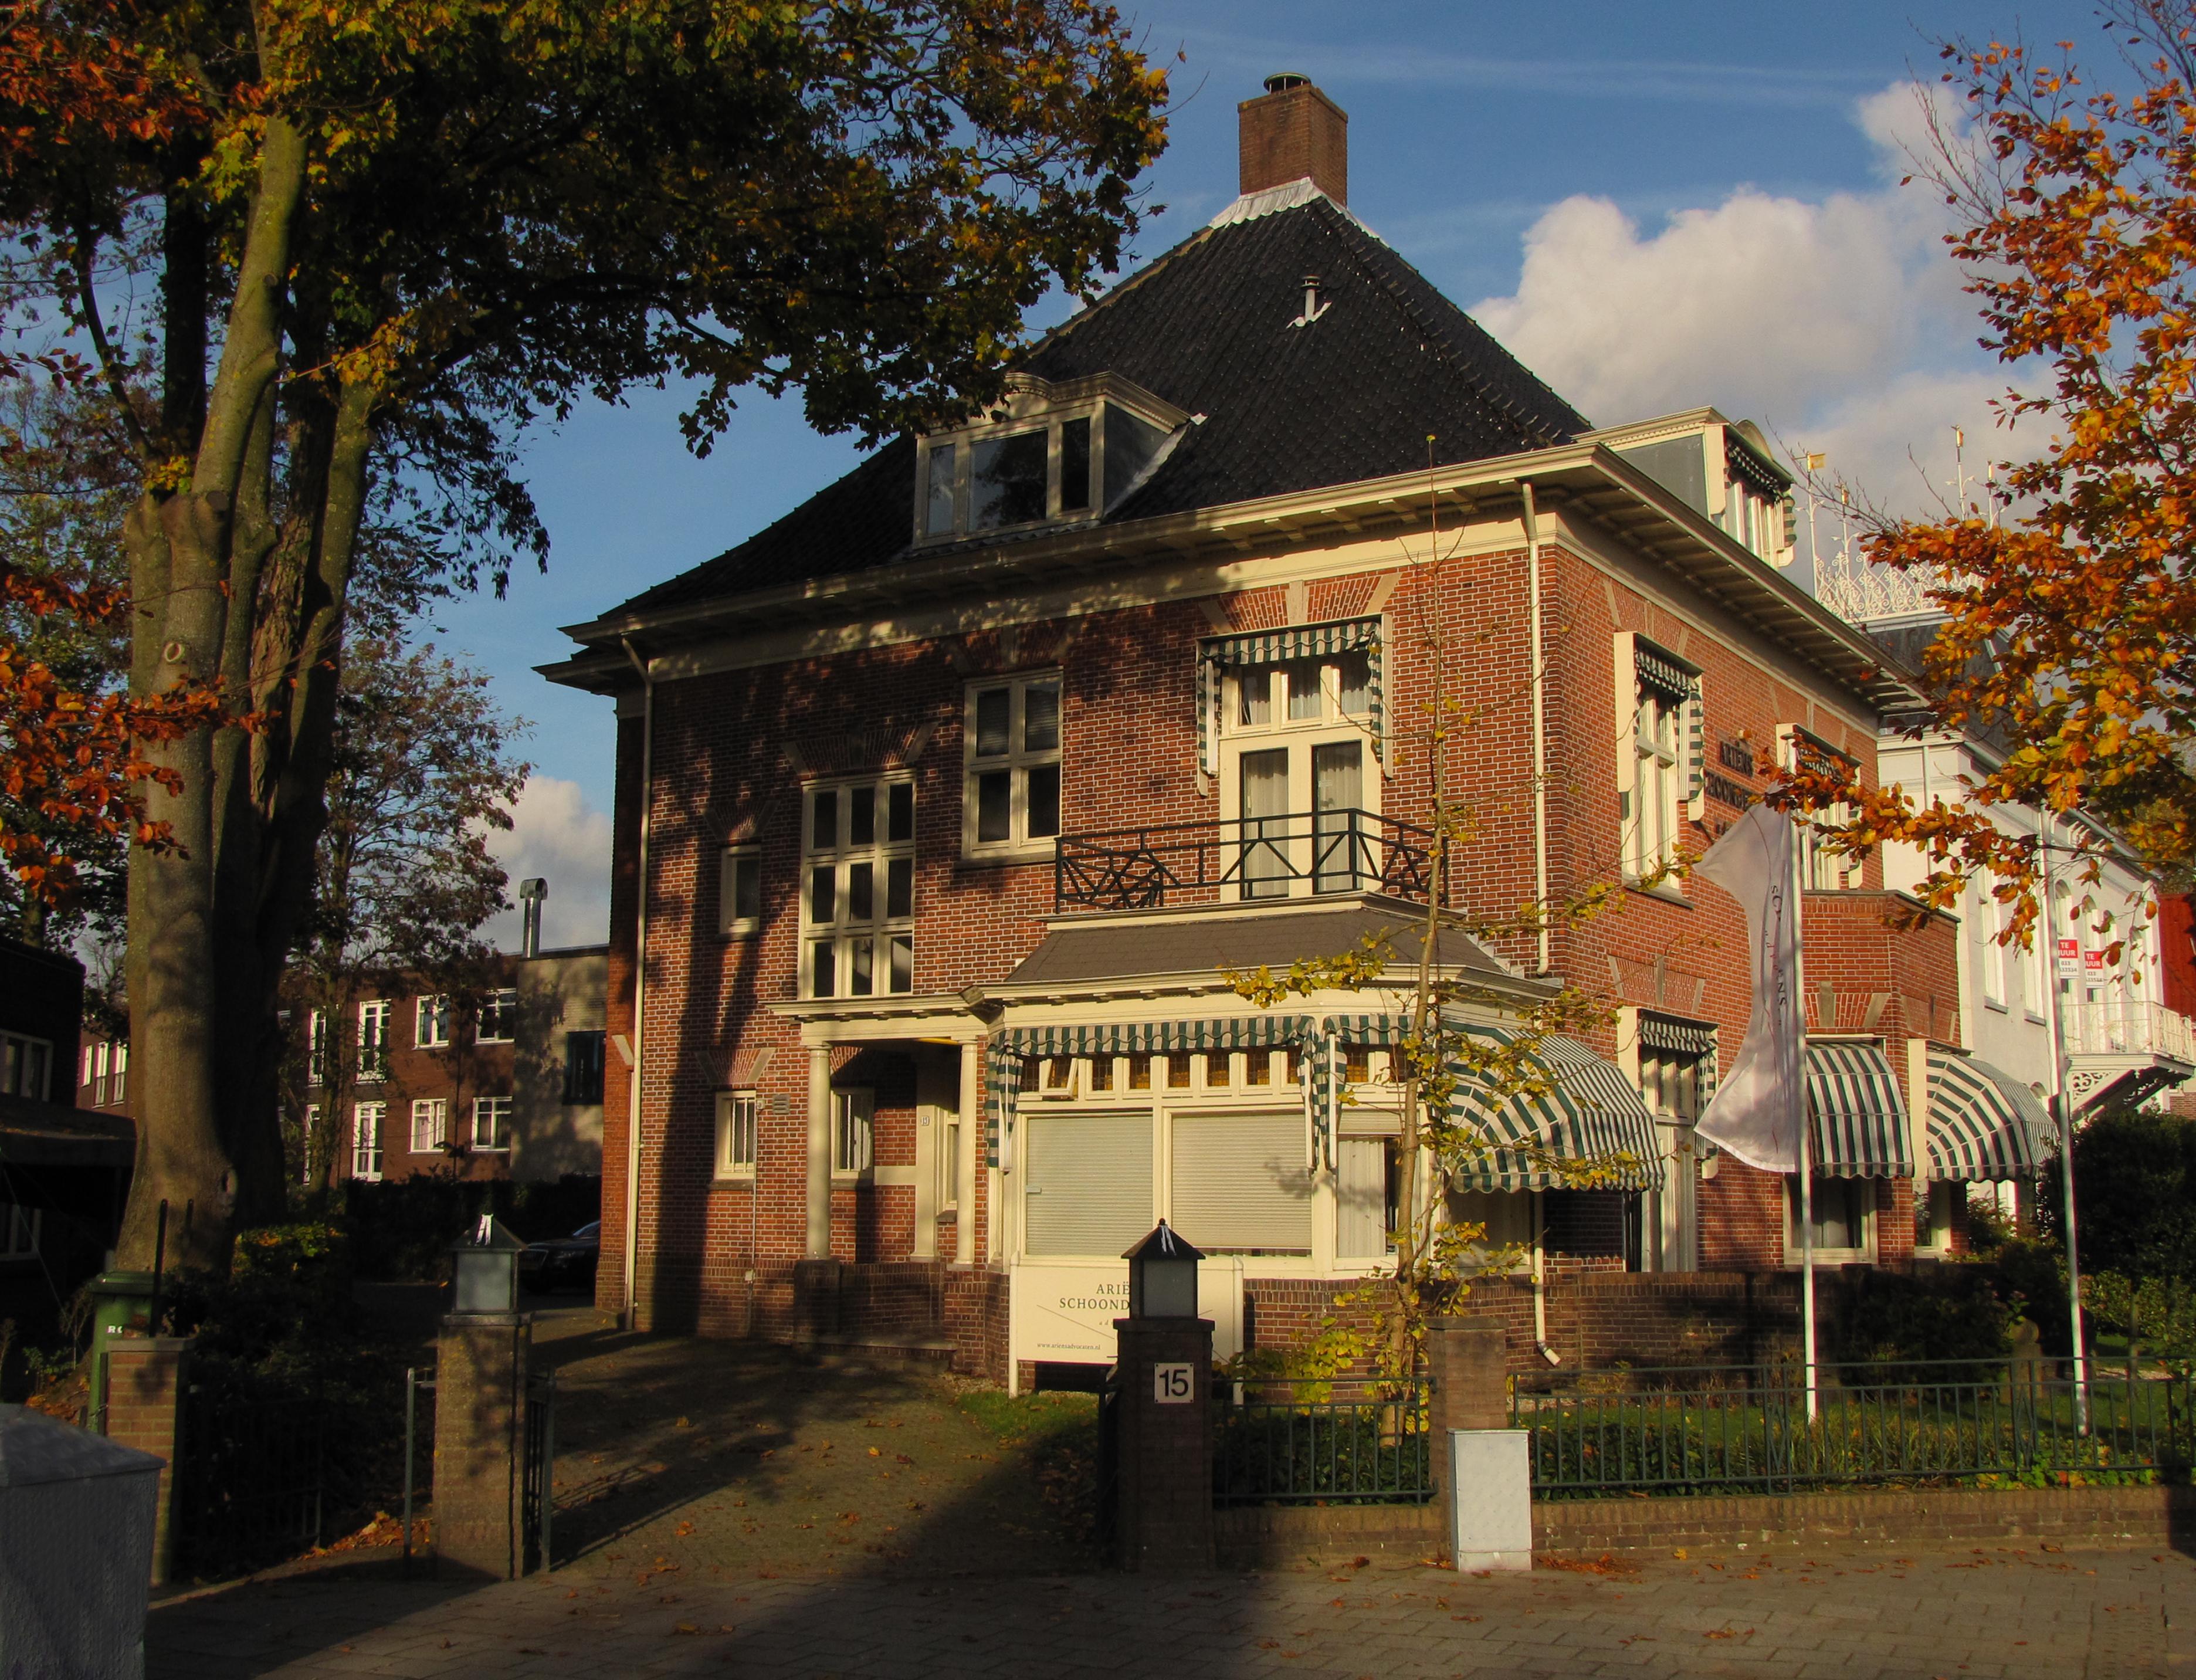 File:Amersfoort, Utrechtseweg 15 GM0307-493.JPG